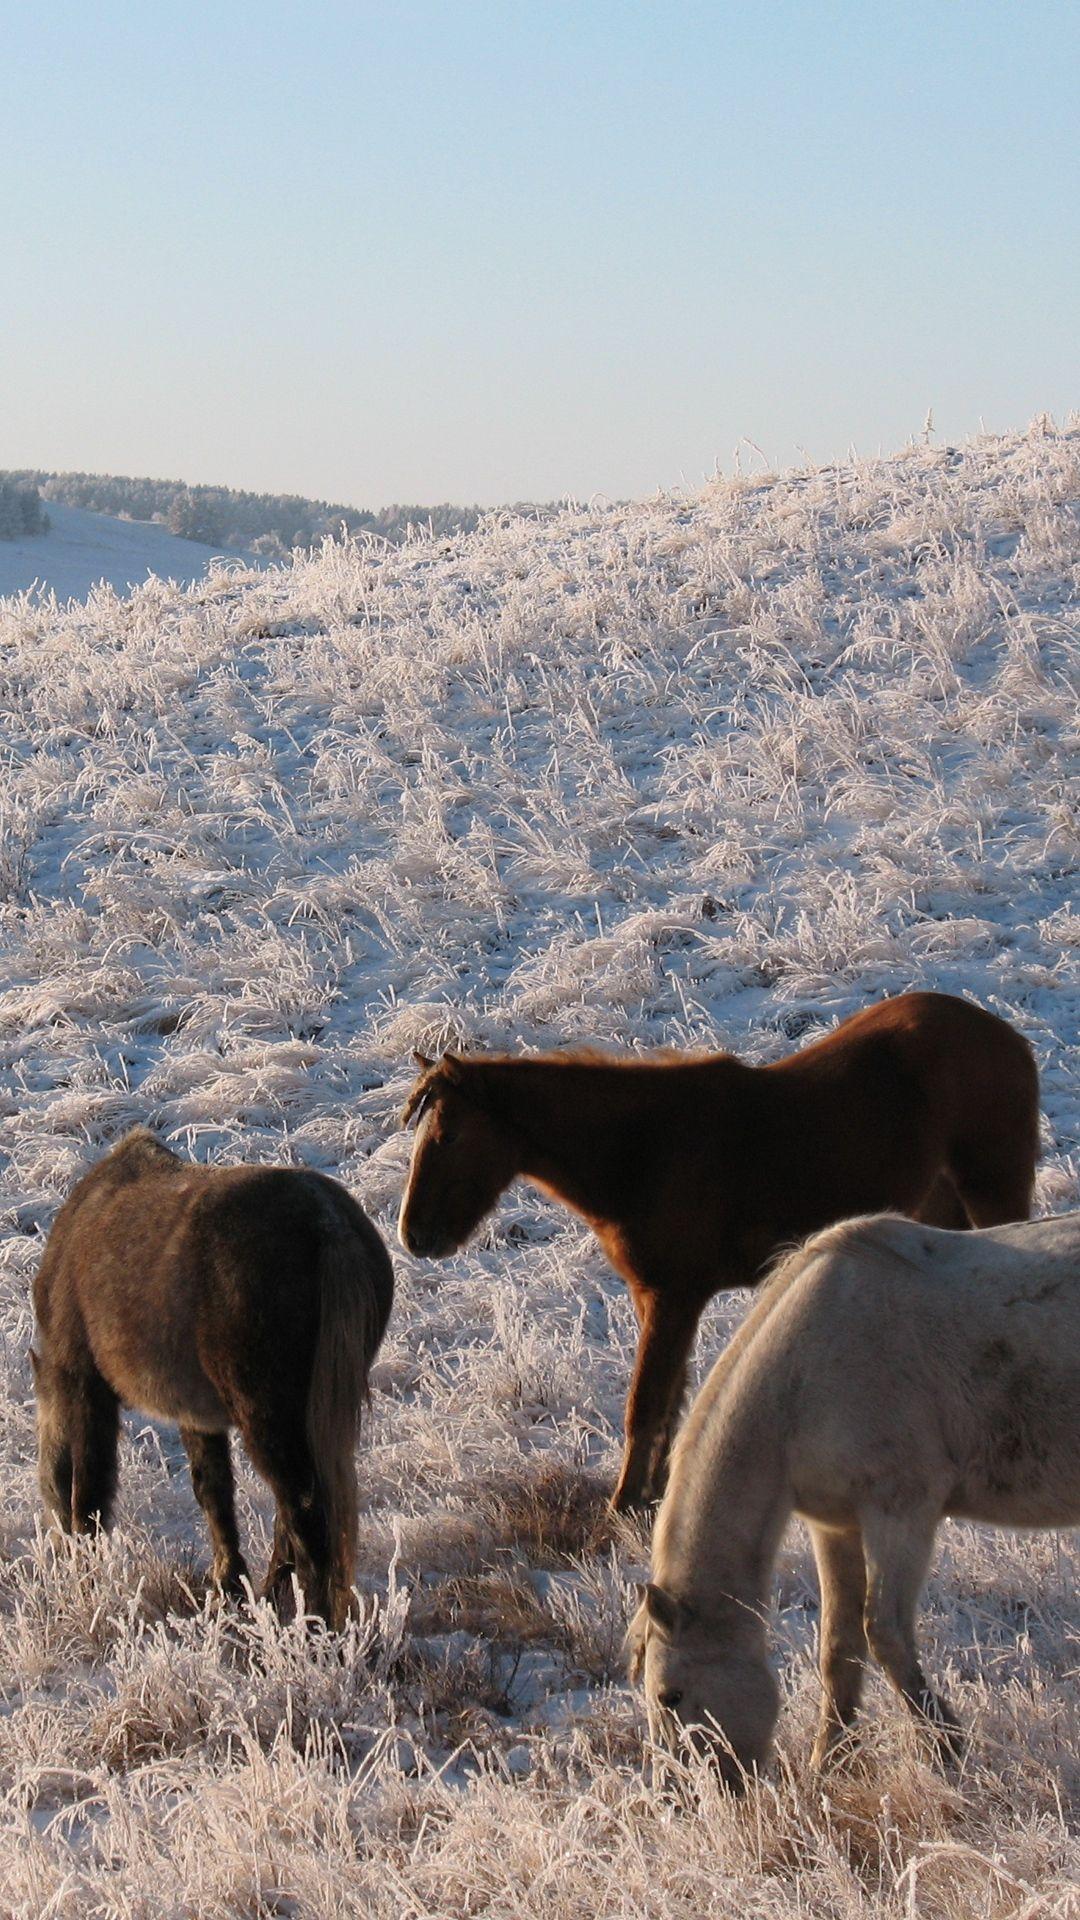 Download Herd, Horse, Mare, Winter, Pasture, Frost Wallpaper, Bac